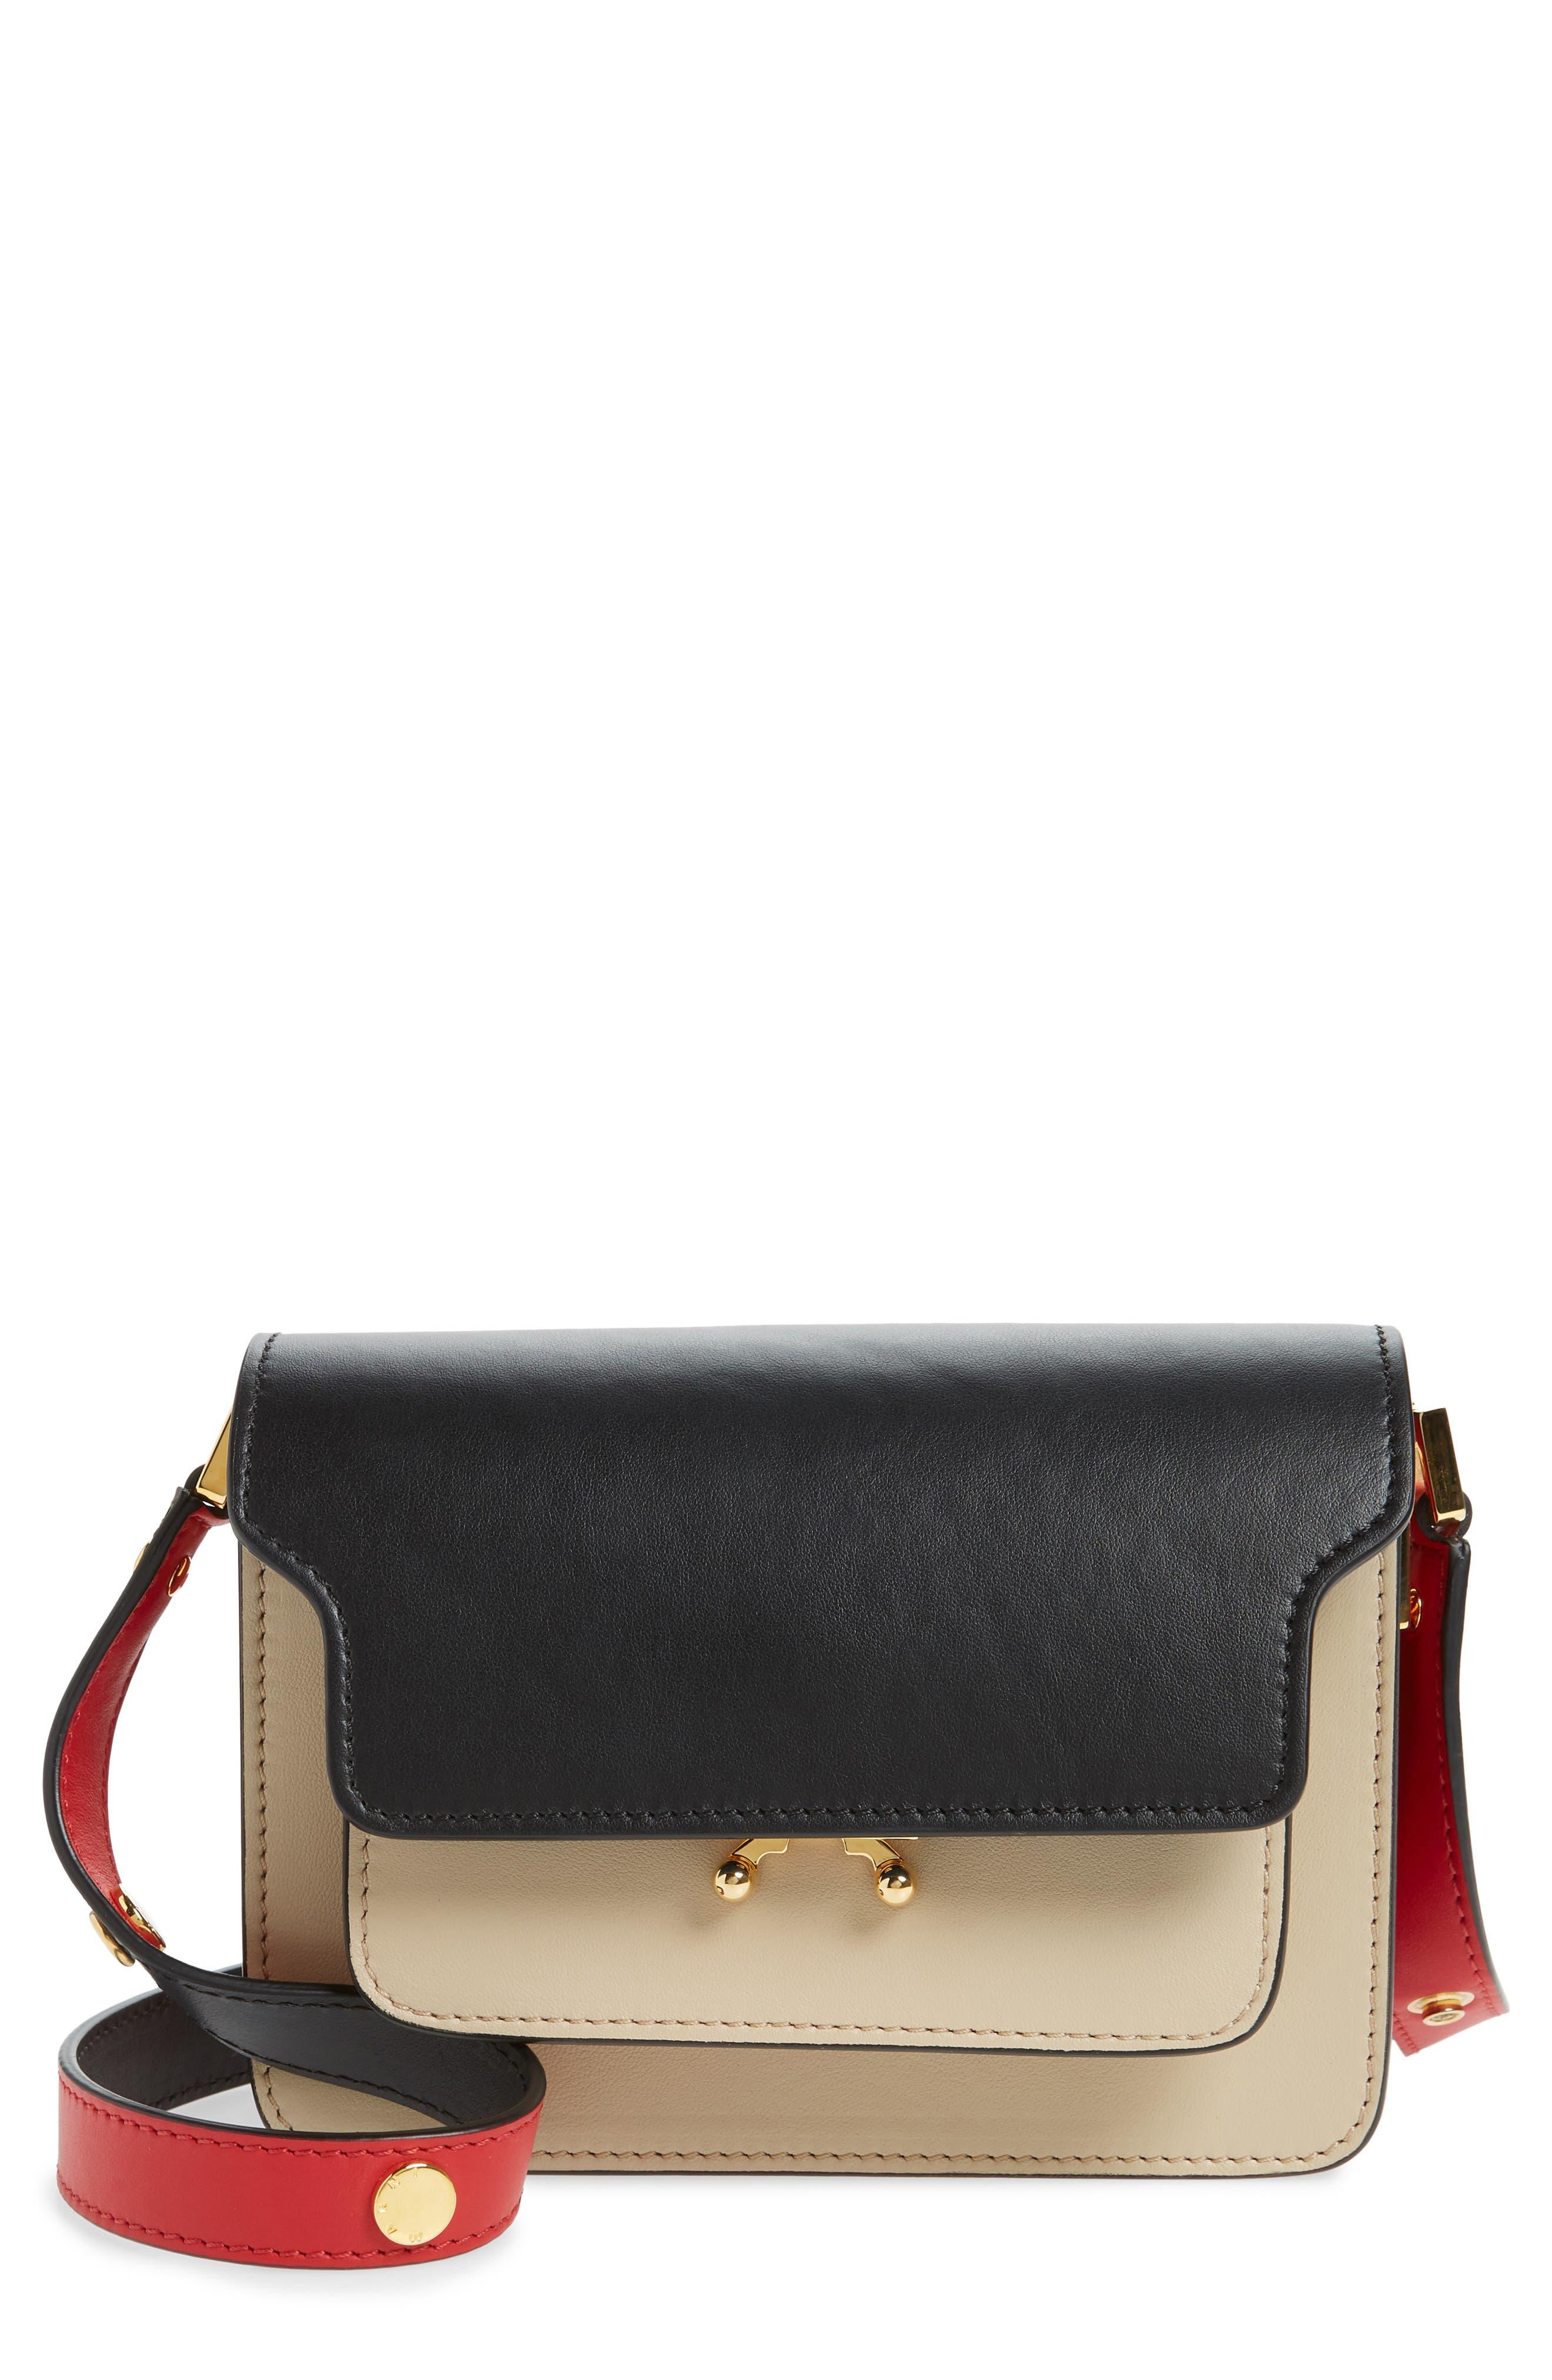 Small Trunk Colorblock Leather Shoulder Bag,                             Main thumbnail 1, color,                             LIGHT CAMEL/ BLACK/ RED